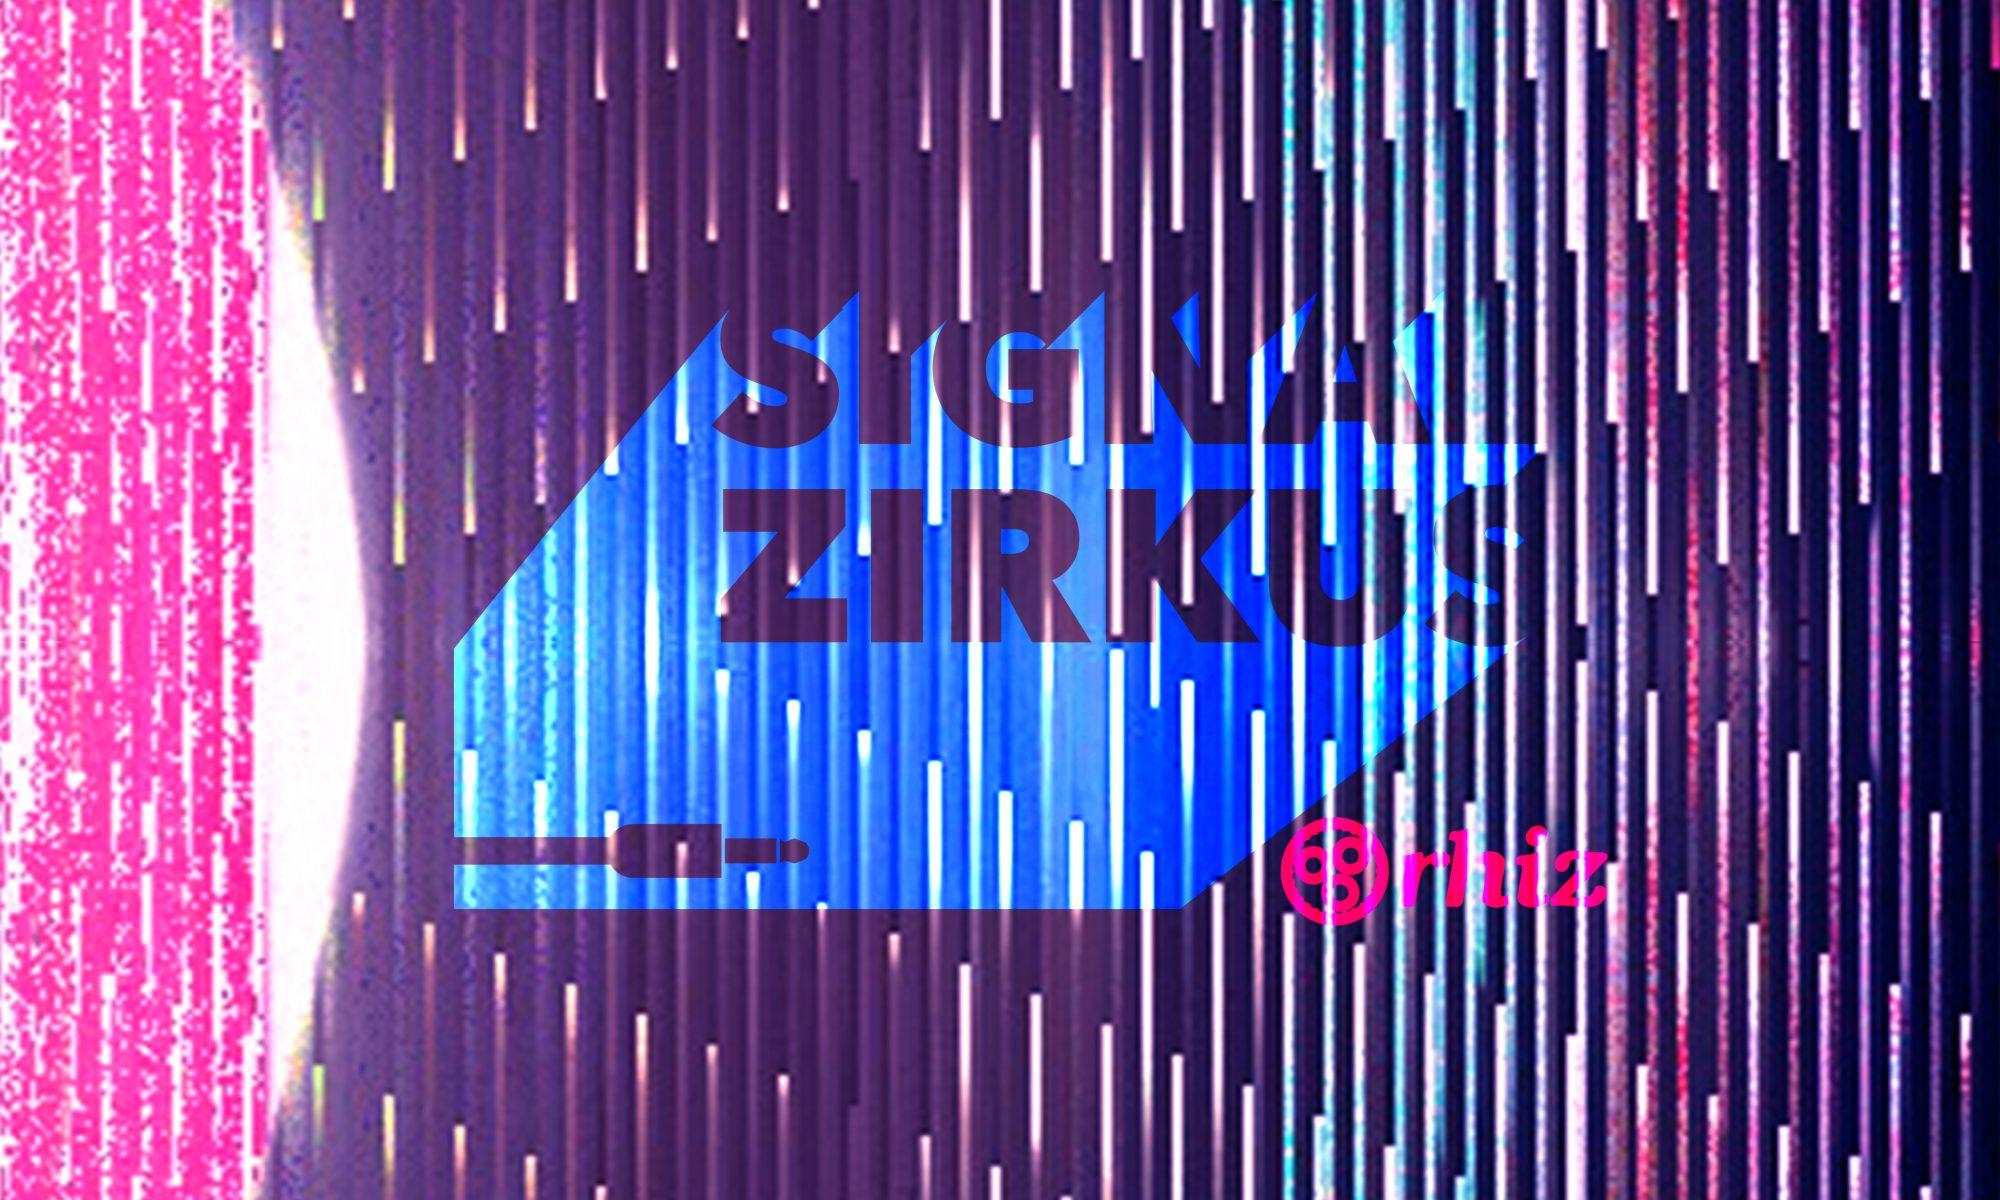 Signal_Zirkus_023_Vorfreude